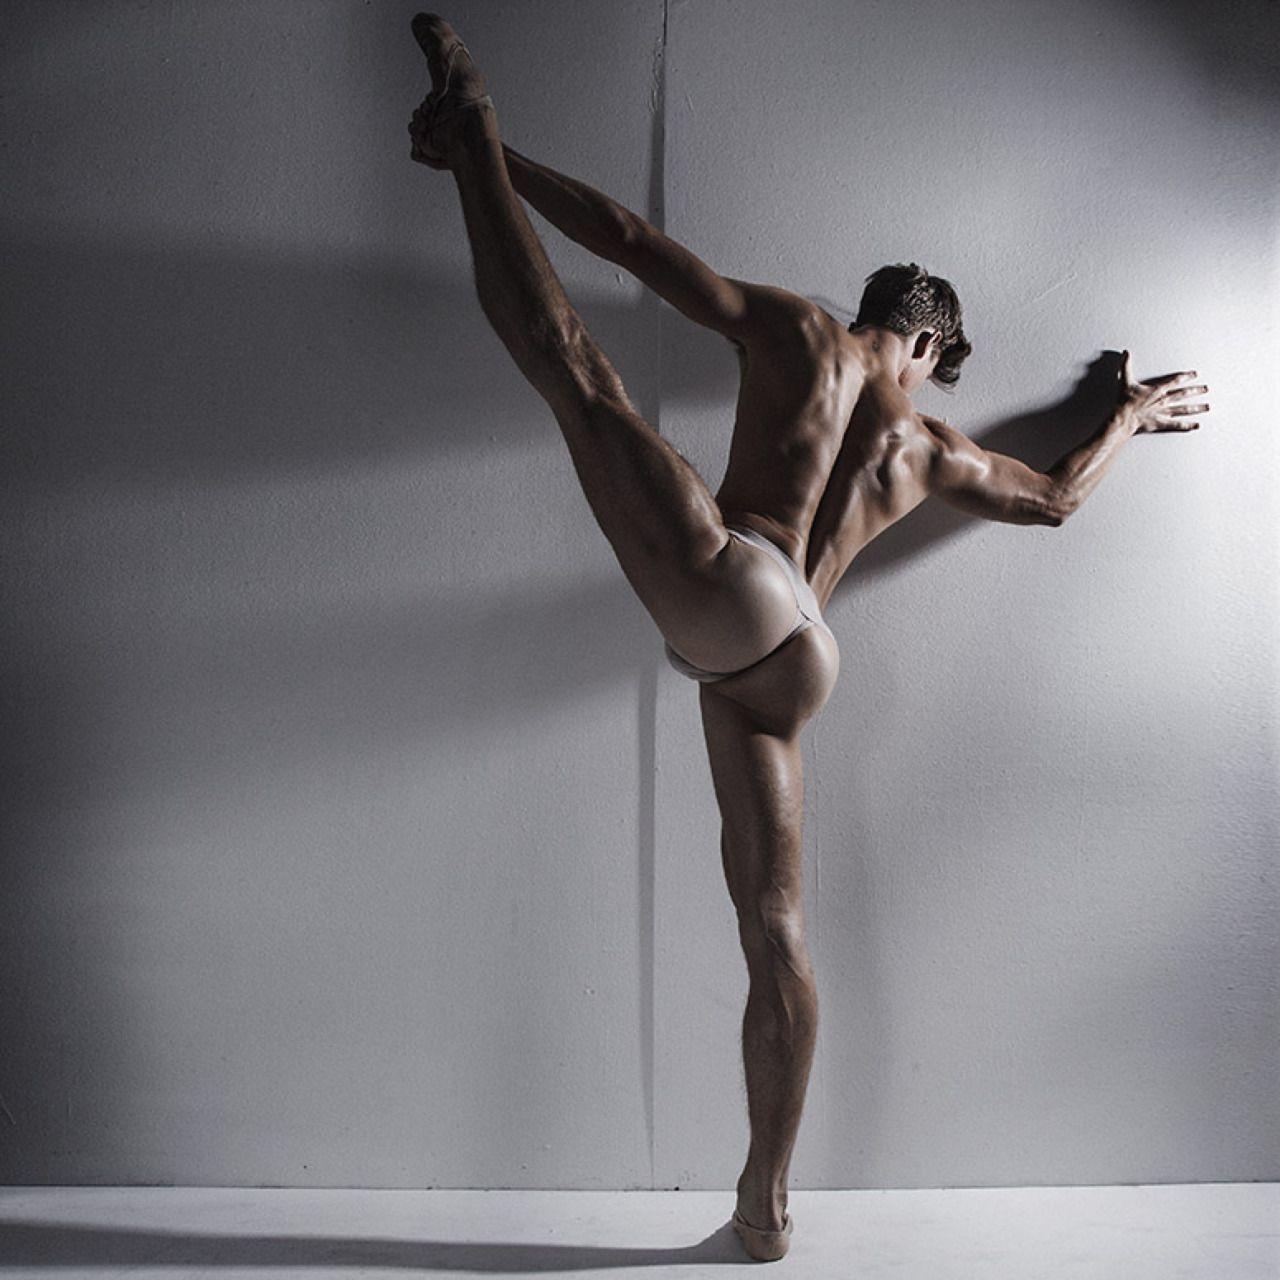 Naked men dancing, mom n son sex naked